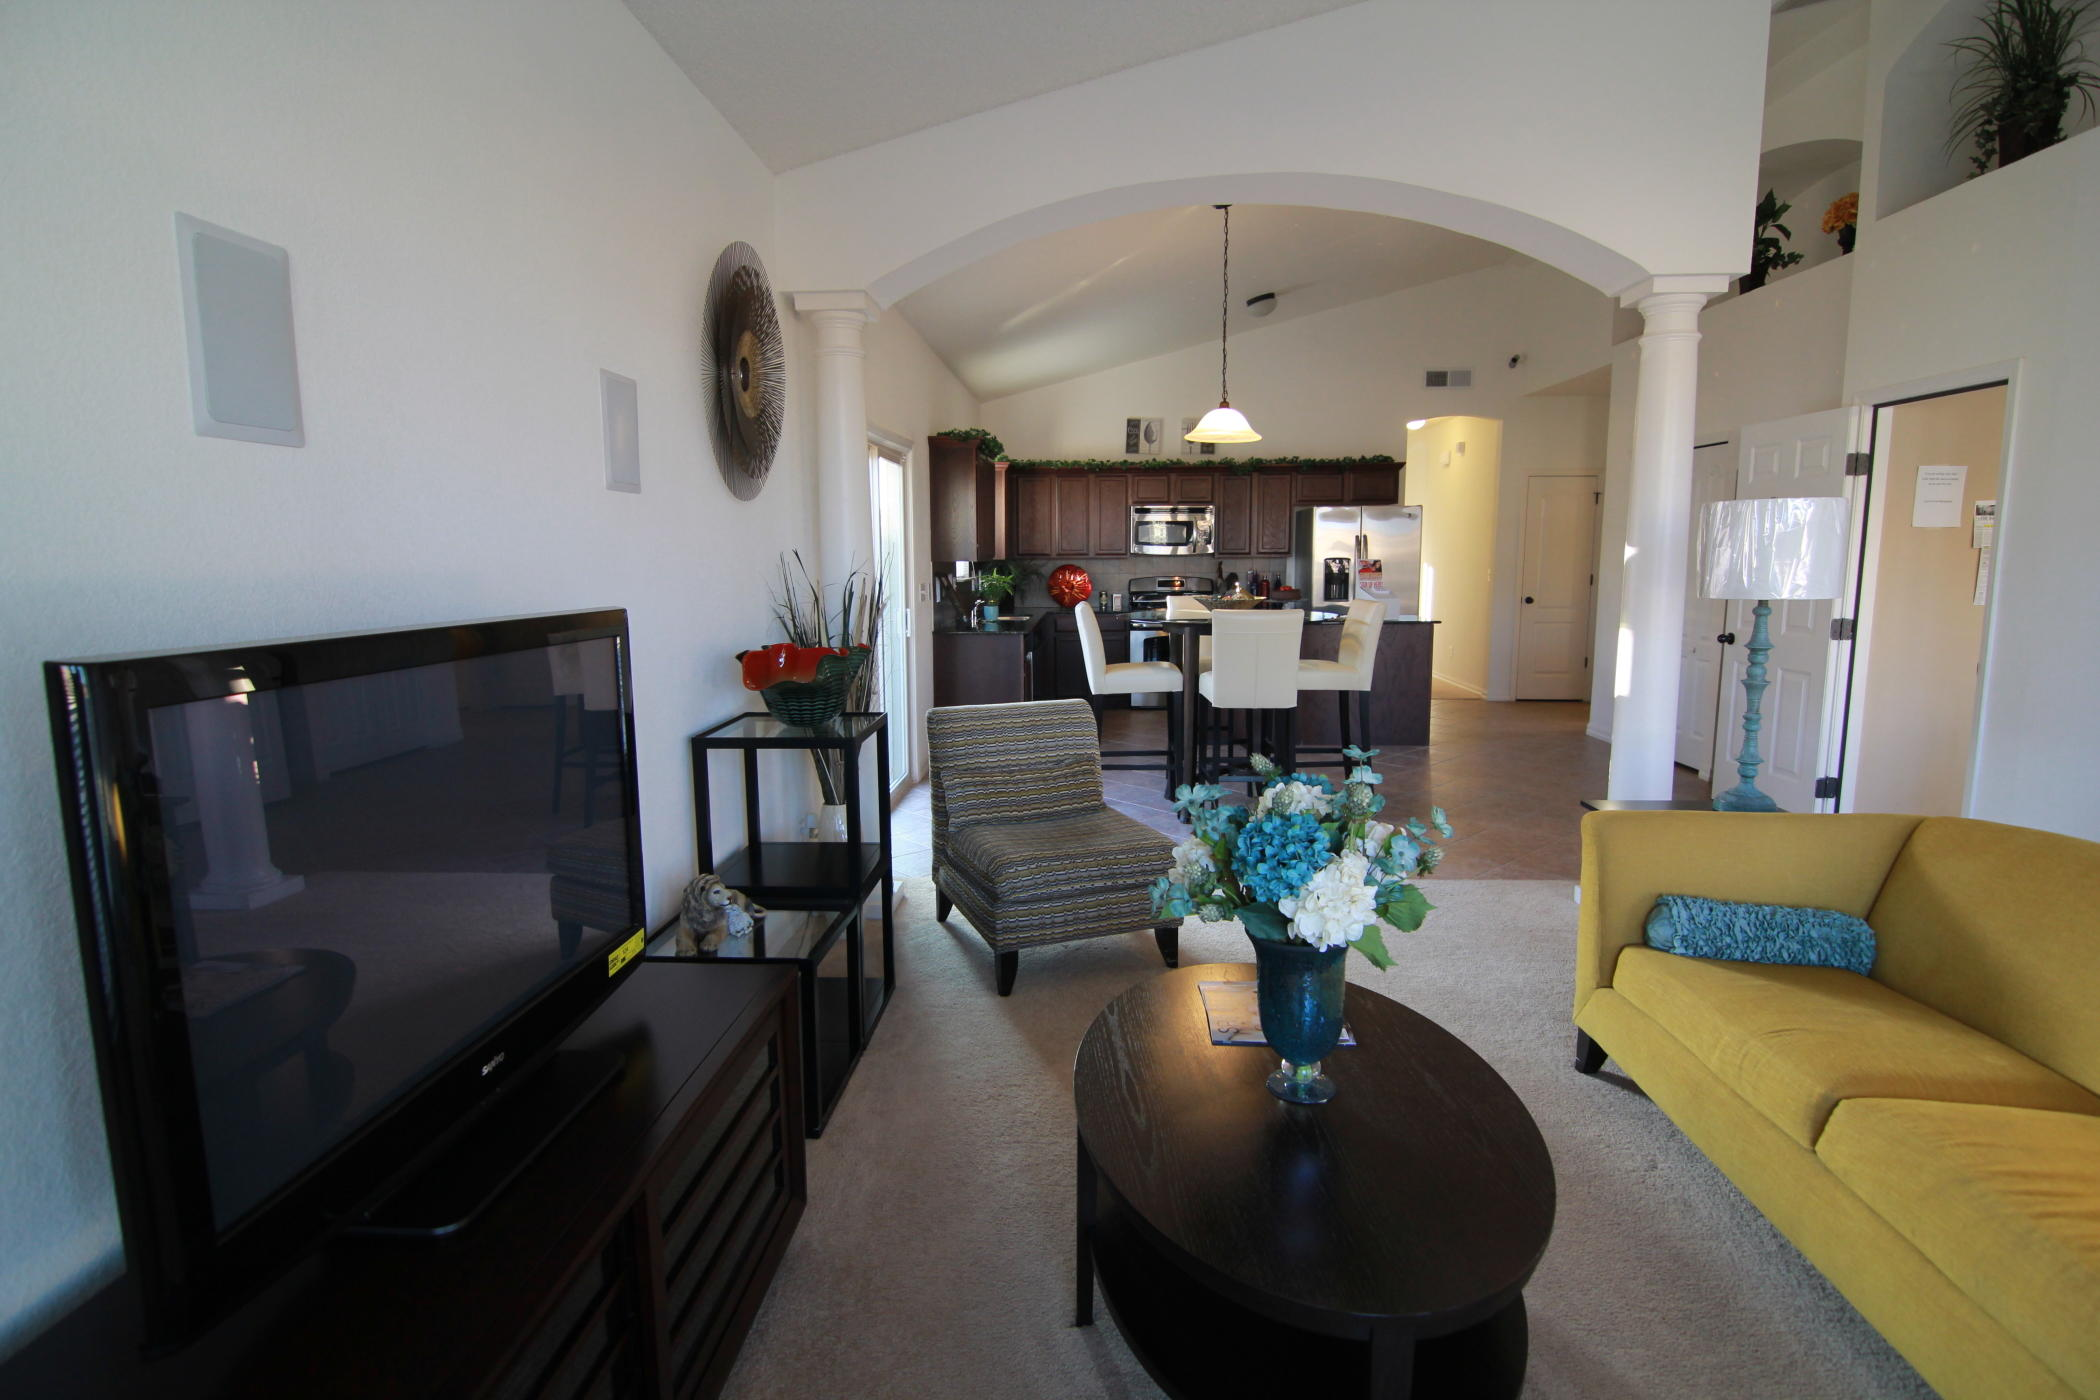 14348 Tobe Davis, Horizon City, Texas 79928, 4 Bedrooms Bedrooms, ,2 BathroomsBathrooms,Residential,For sale,Tobe Davis,804574